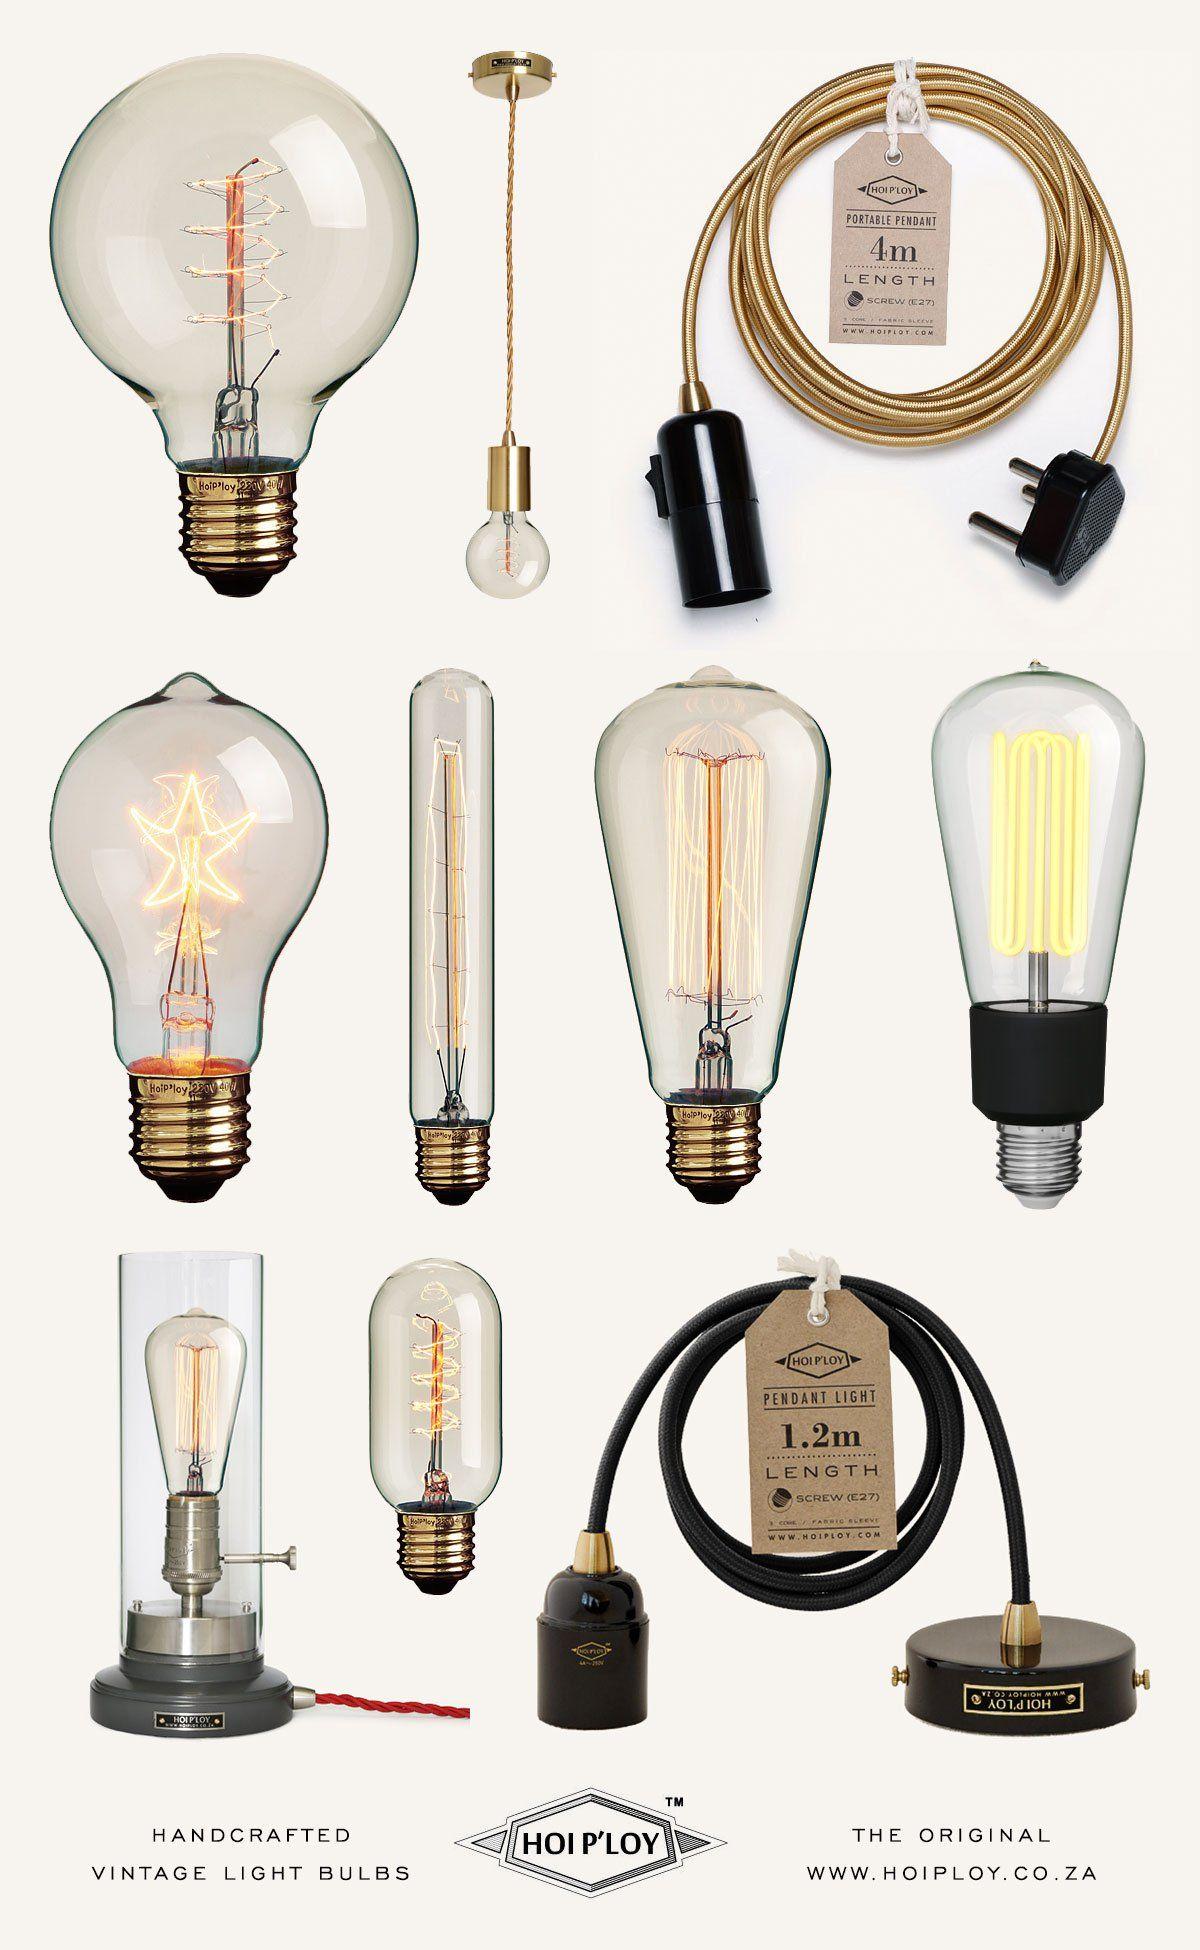 Visits Hoi P Loy Hanging Light Bulbs Retro Light Bulbs Lighting